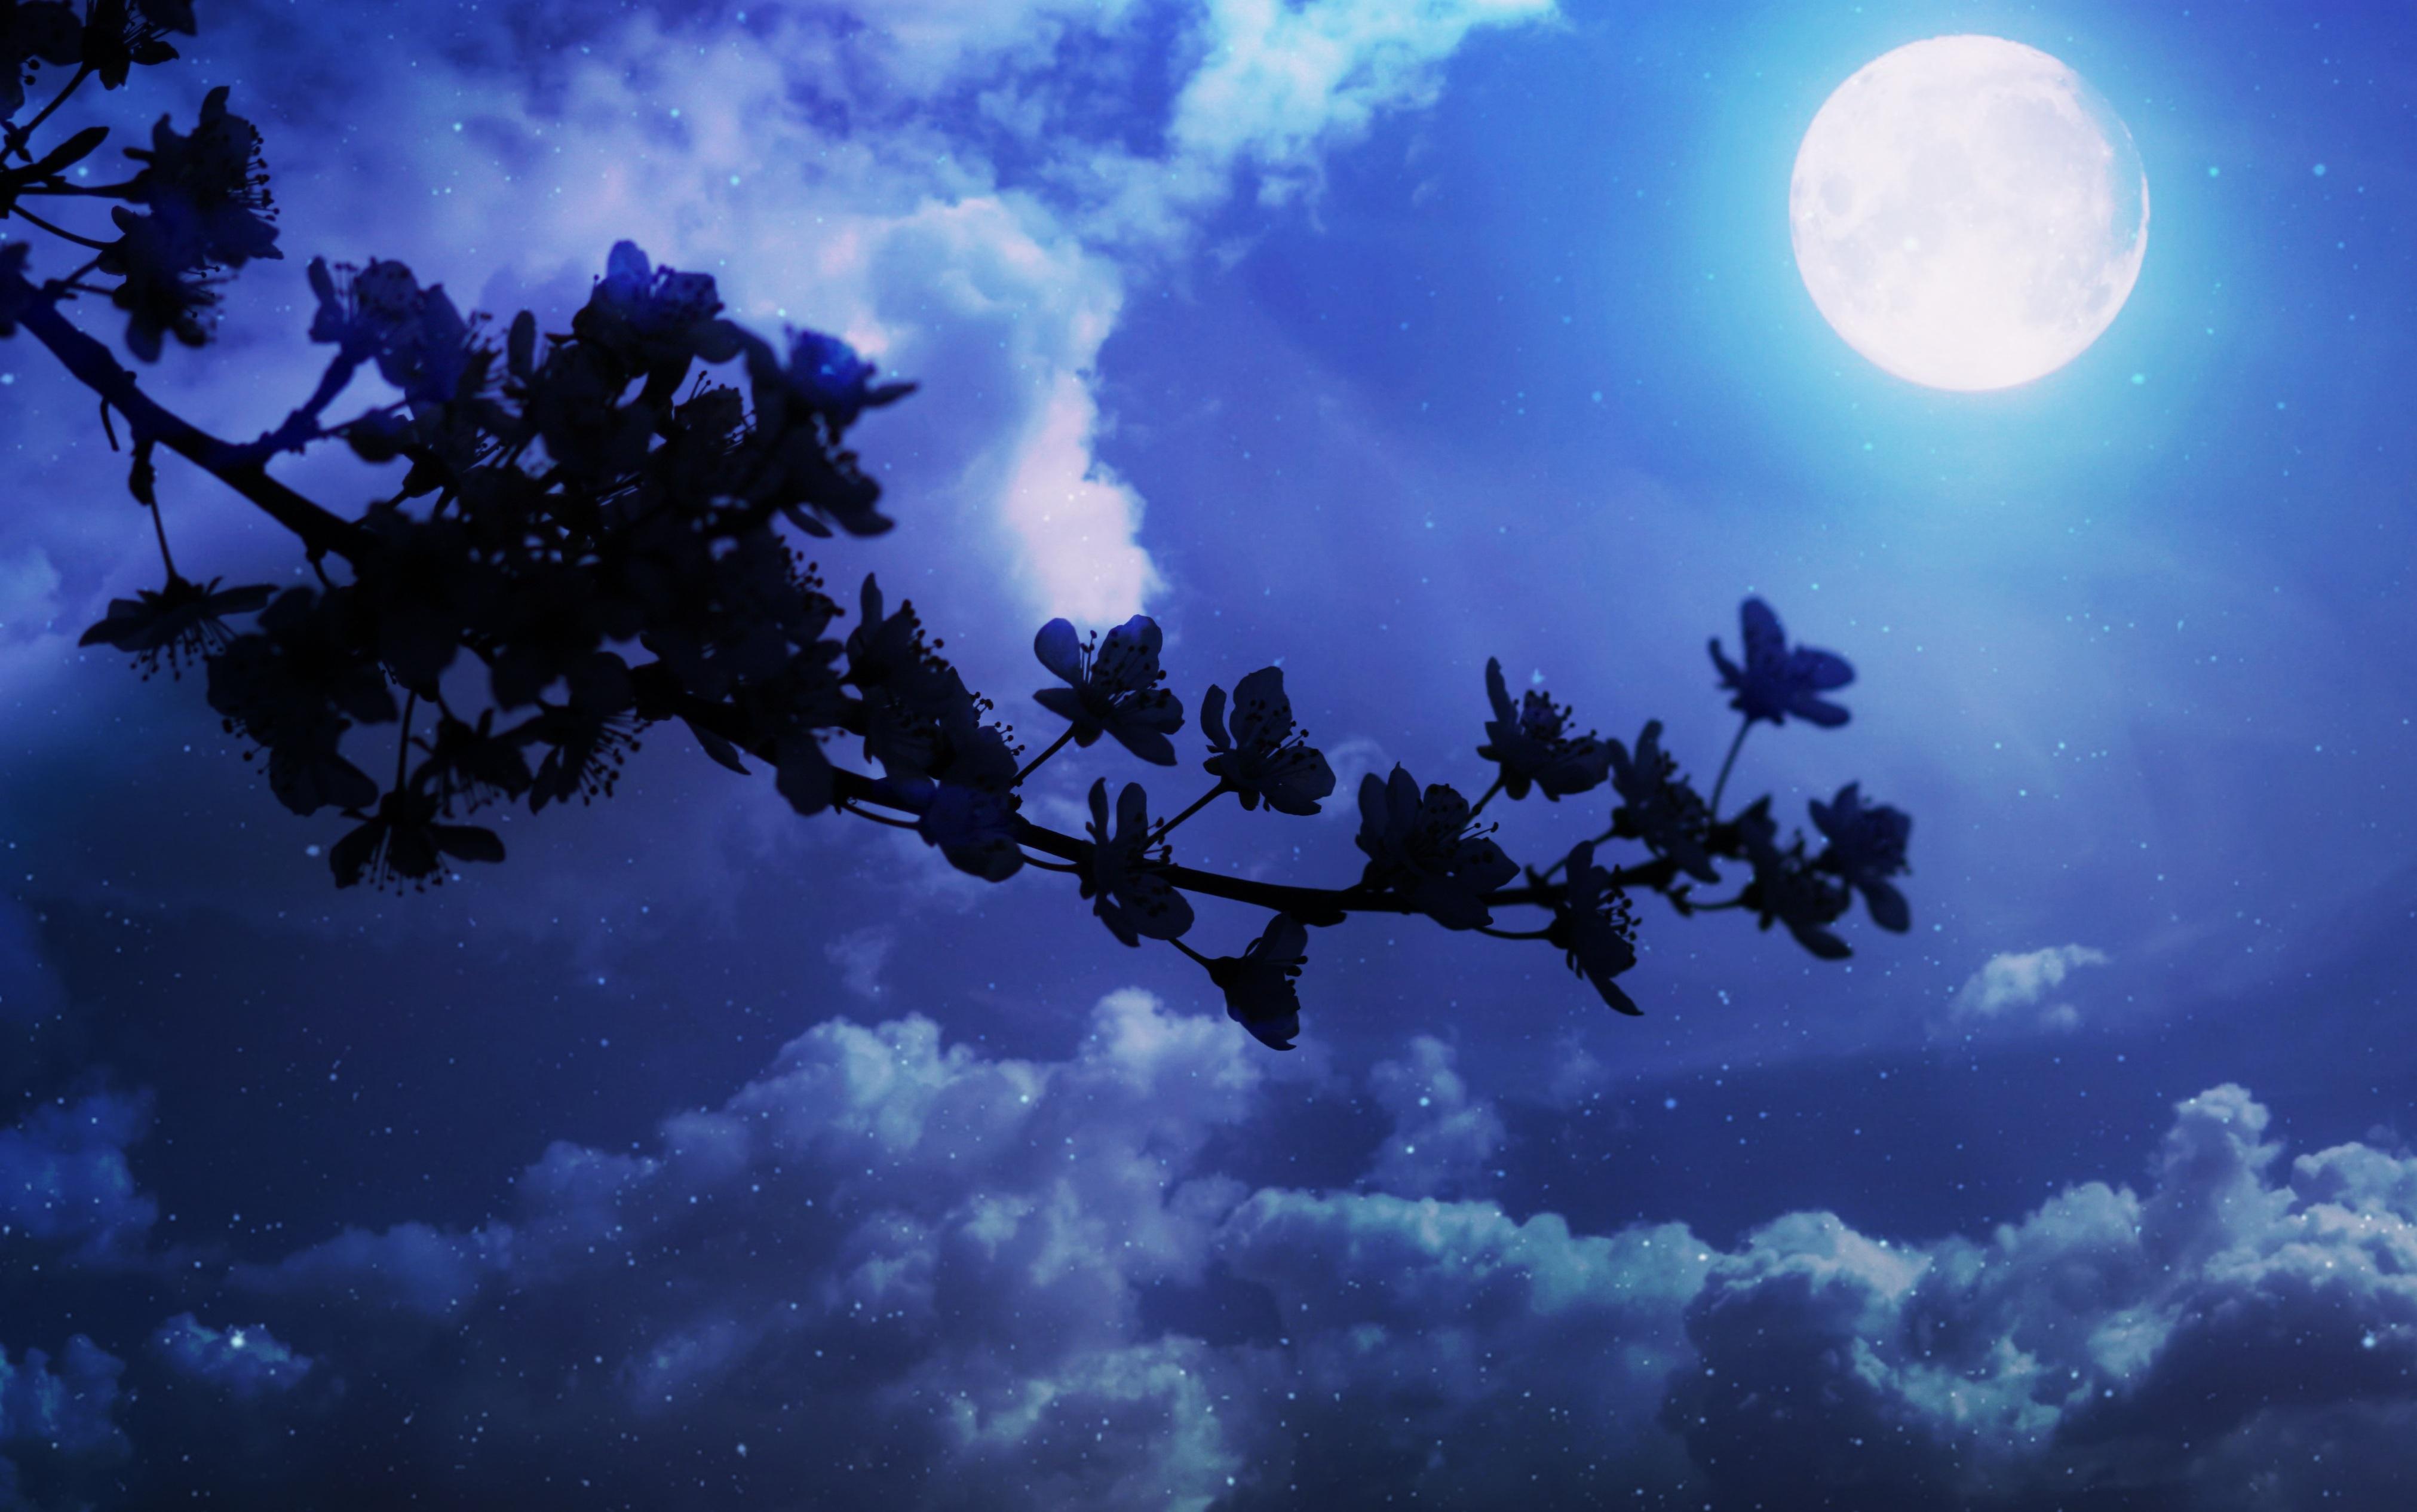 Light Cloud Sky Night Sunlight Atmosphere Spring Shadow Darkness Full Moon Moonlight Flowers Luna Astronomical Object